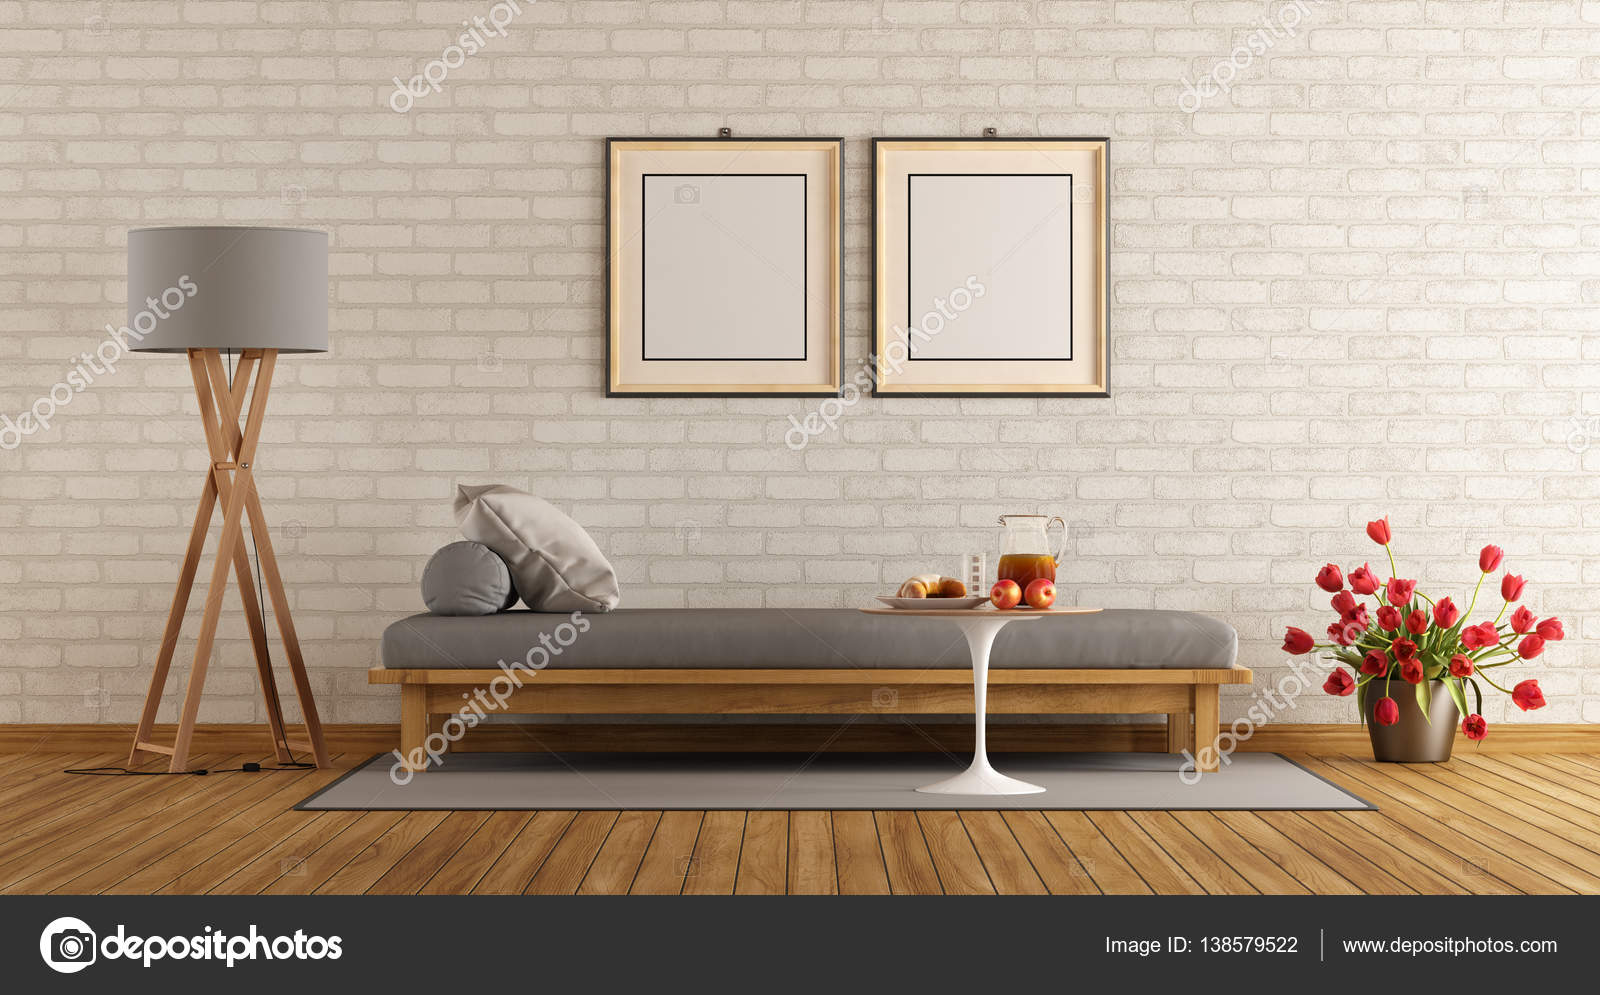 Moderne lounge met dag bed u2014 stockfoto © archideaphoto #138579522